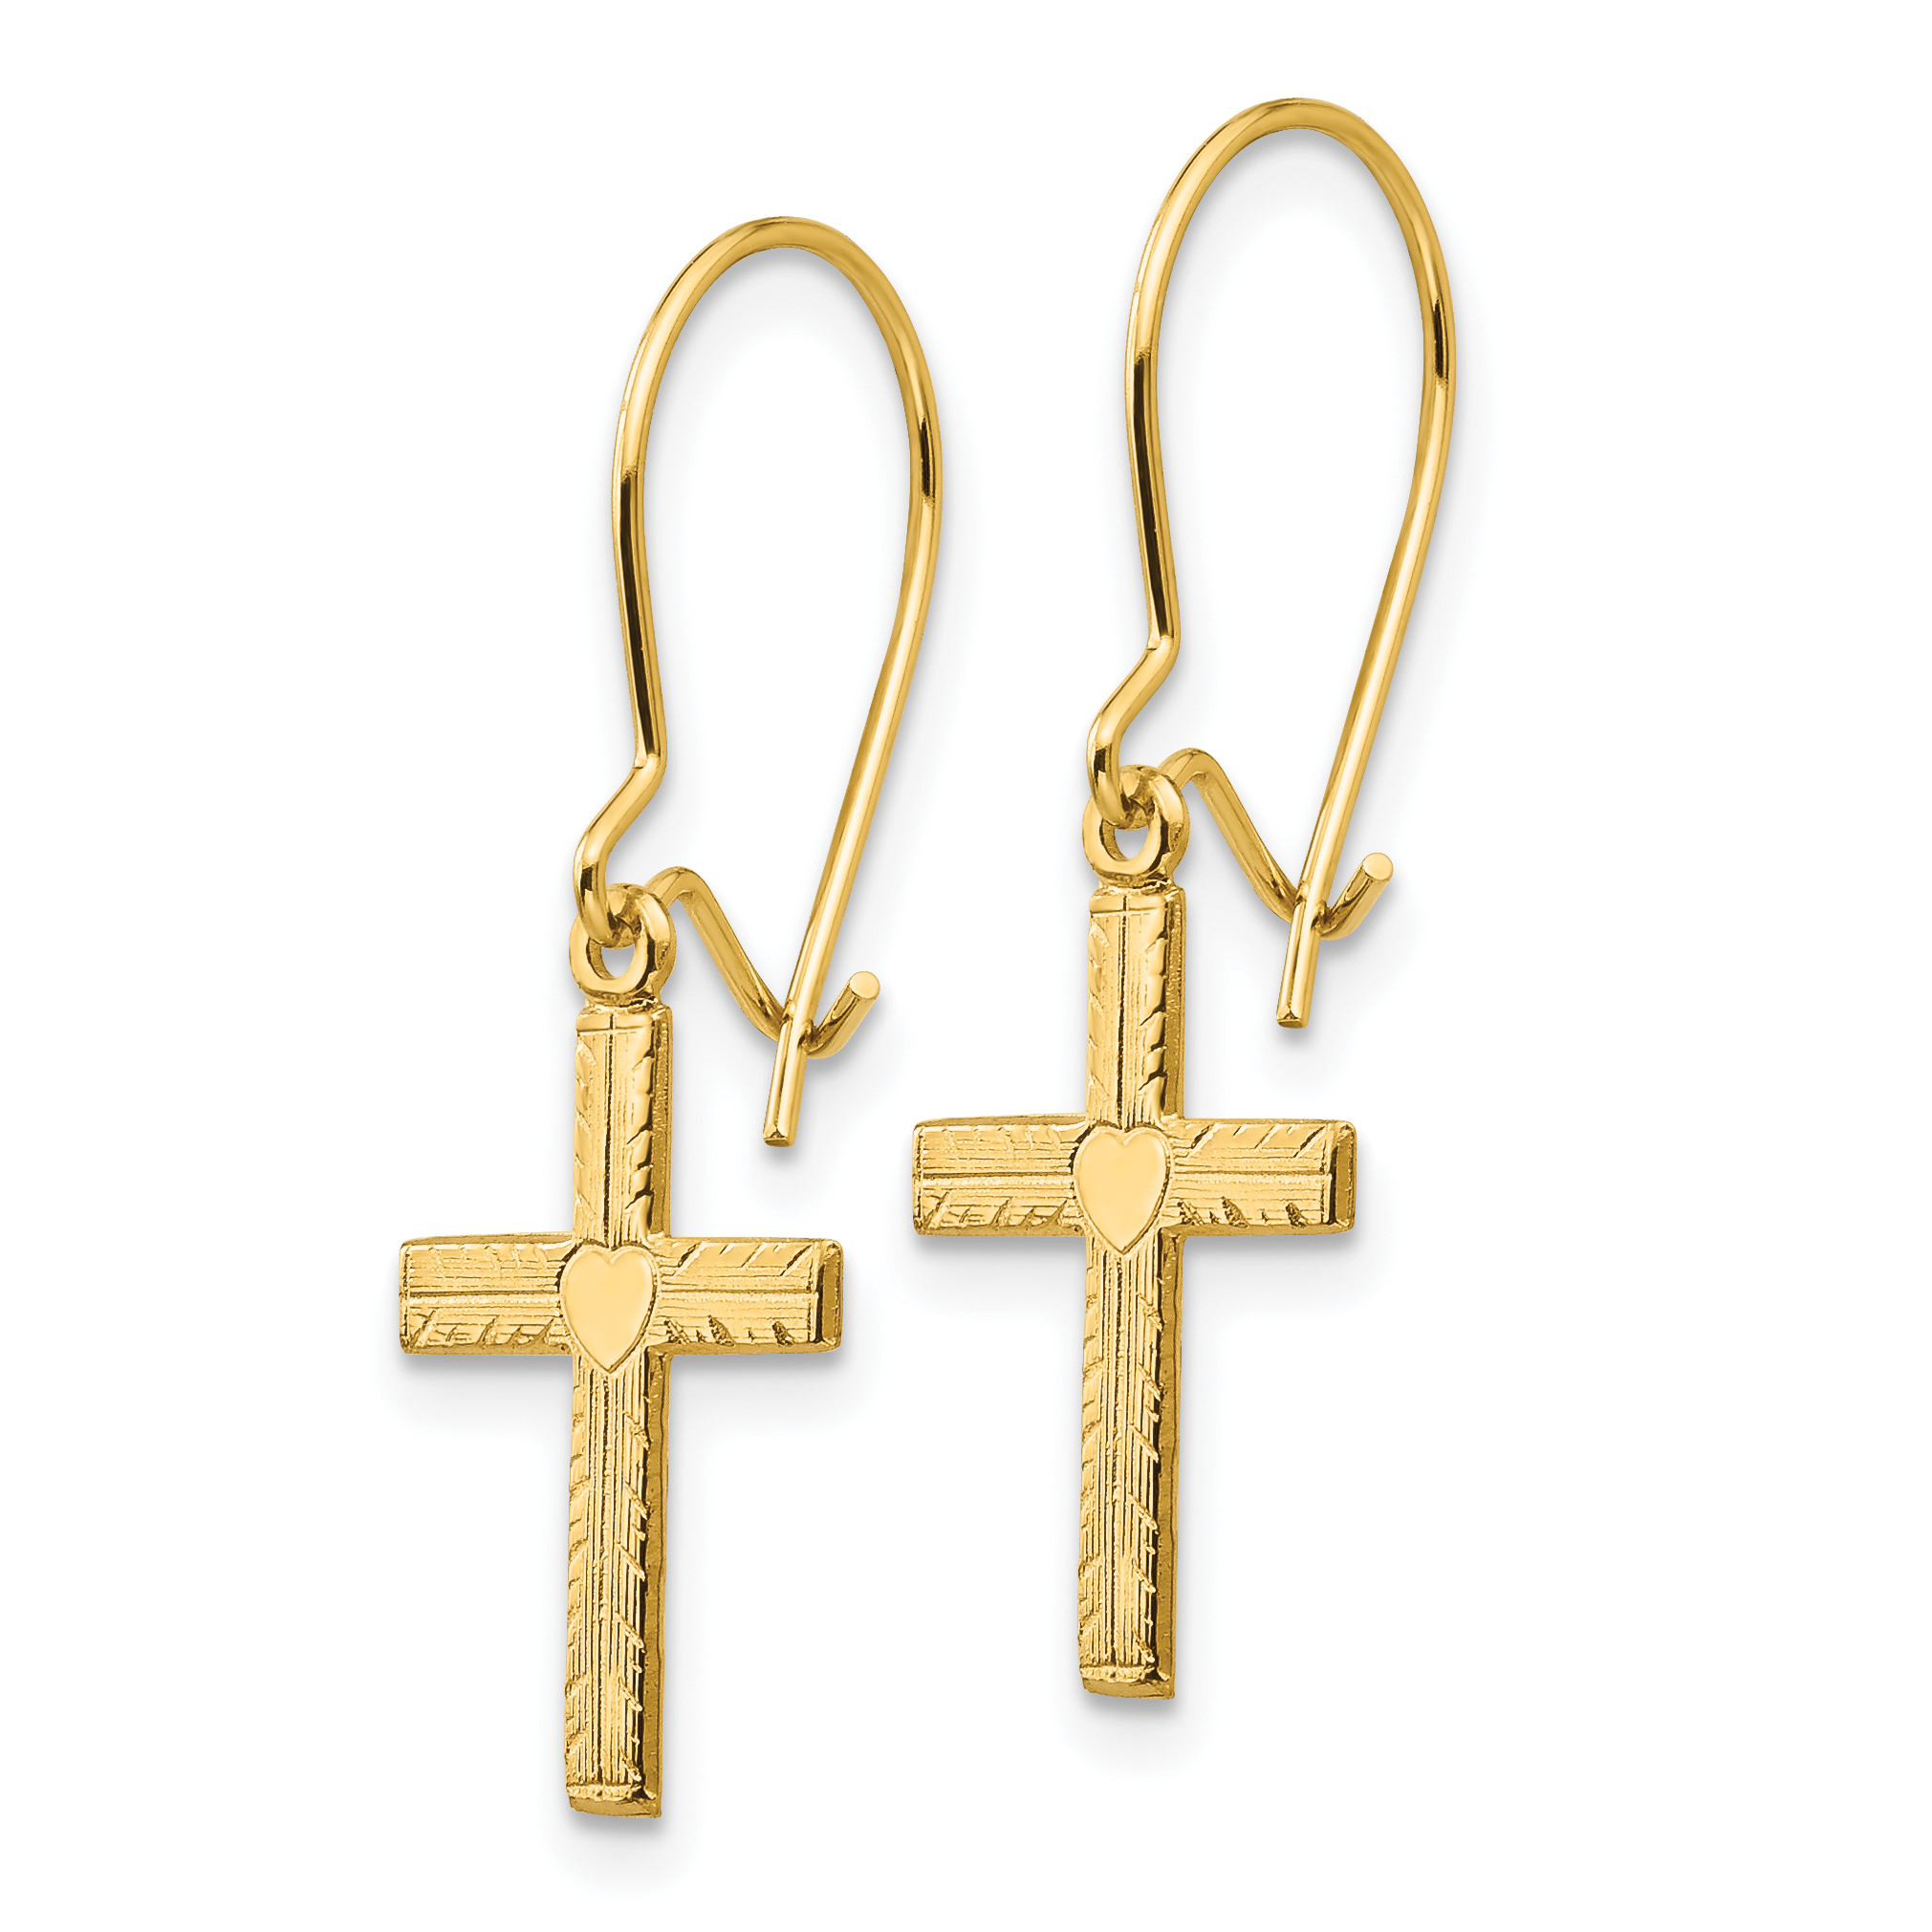 1.5 Height 14k Gold Polished Fancy Teardrop Drop and Dangle Jackets for Stud Earrings